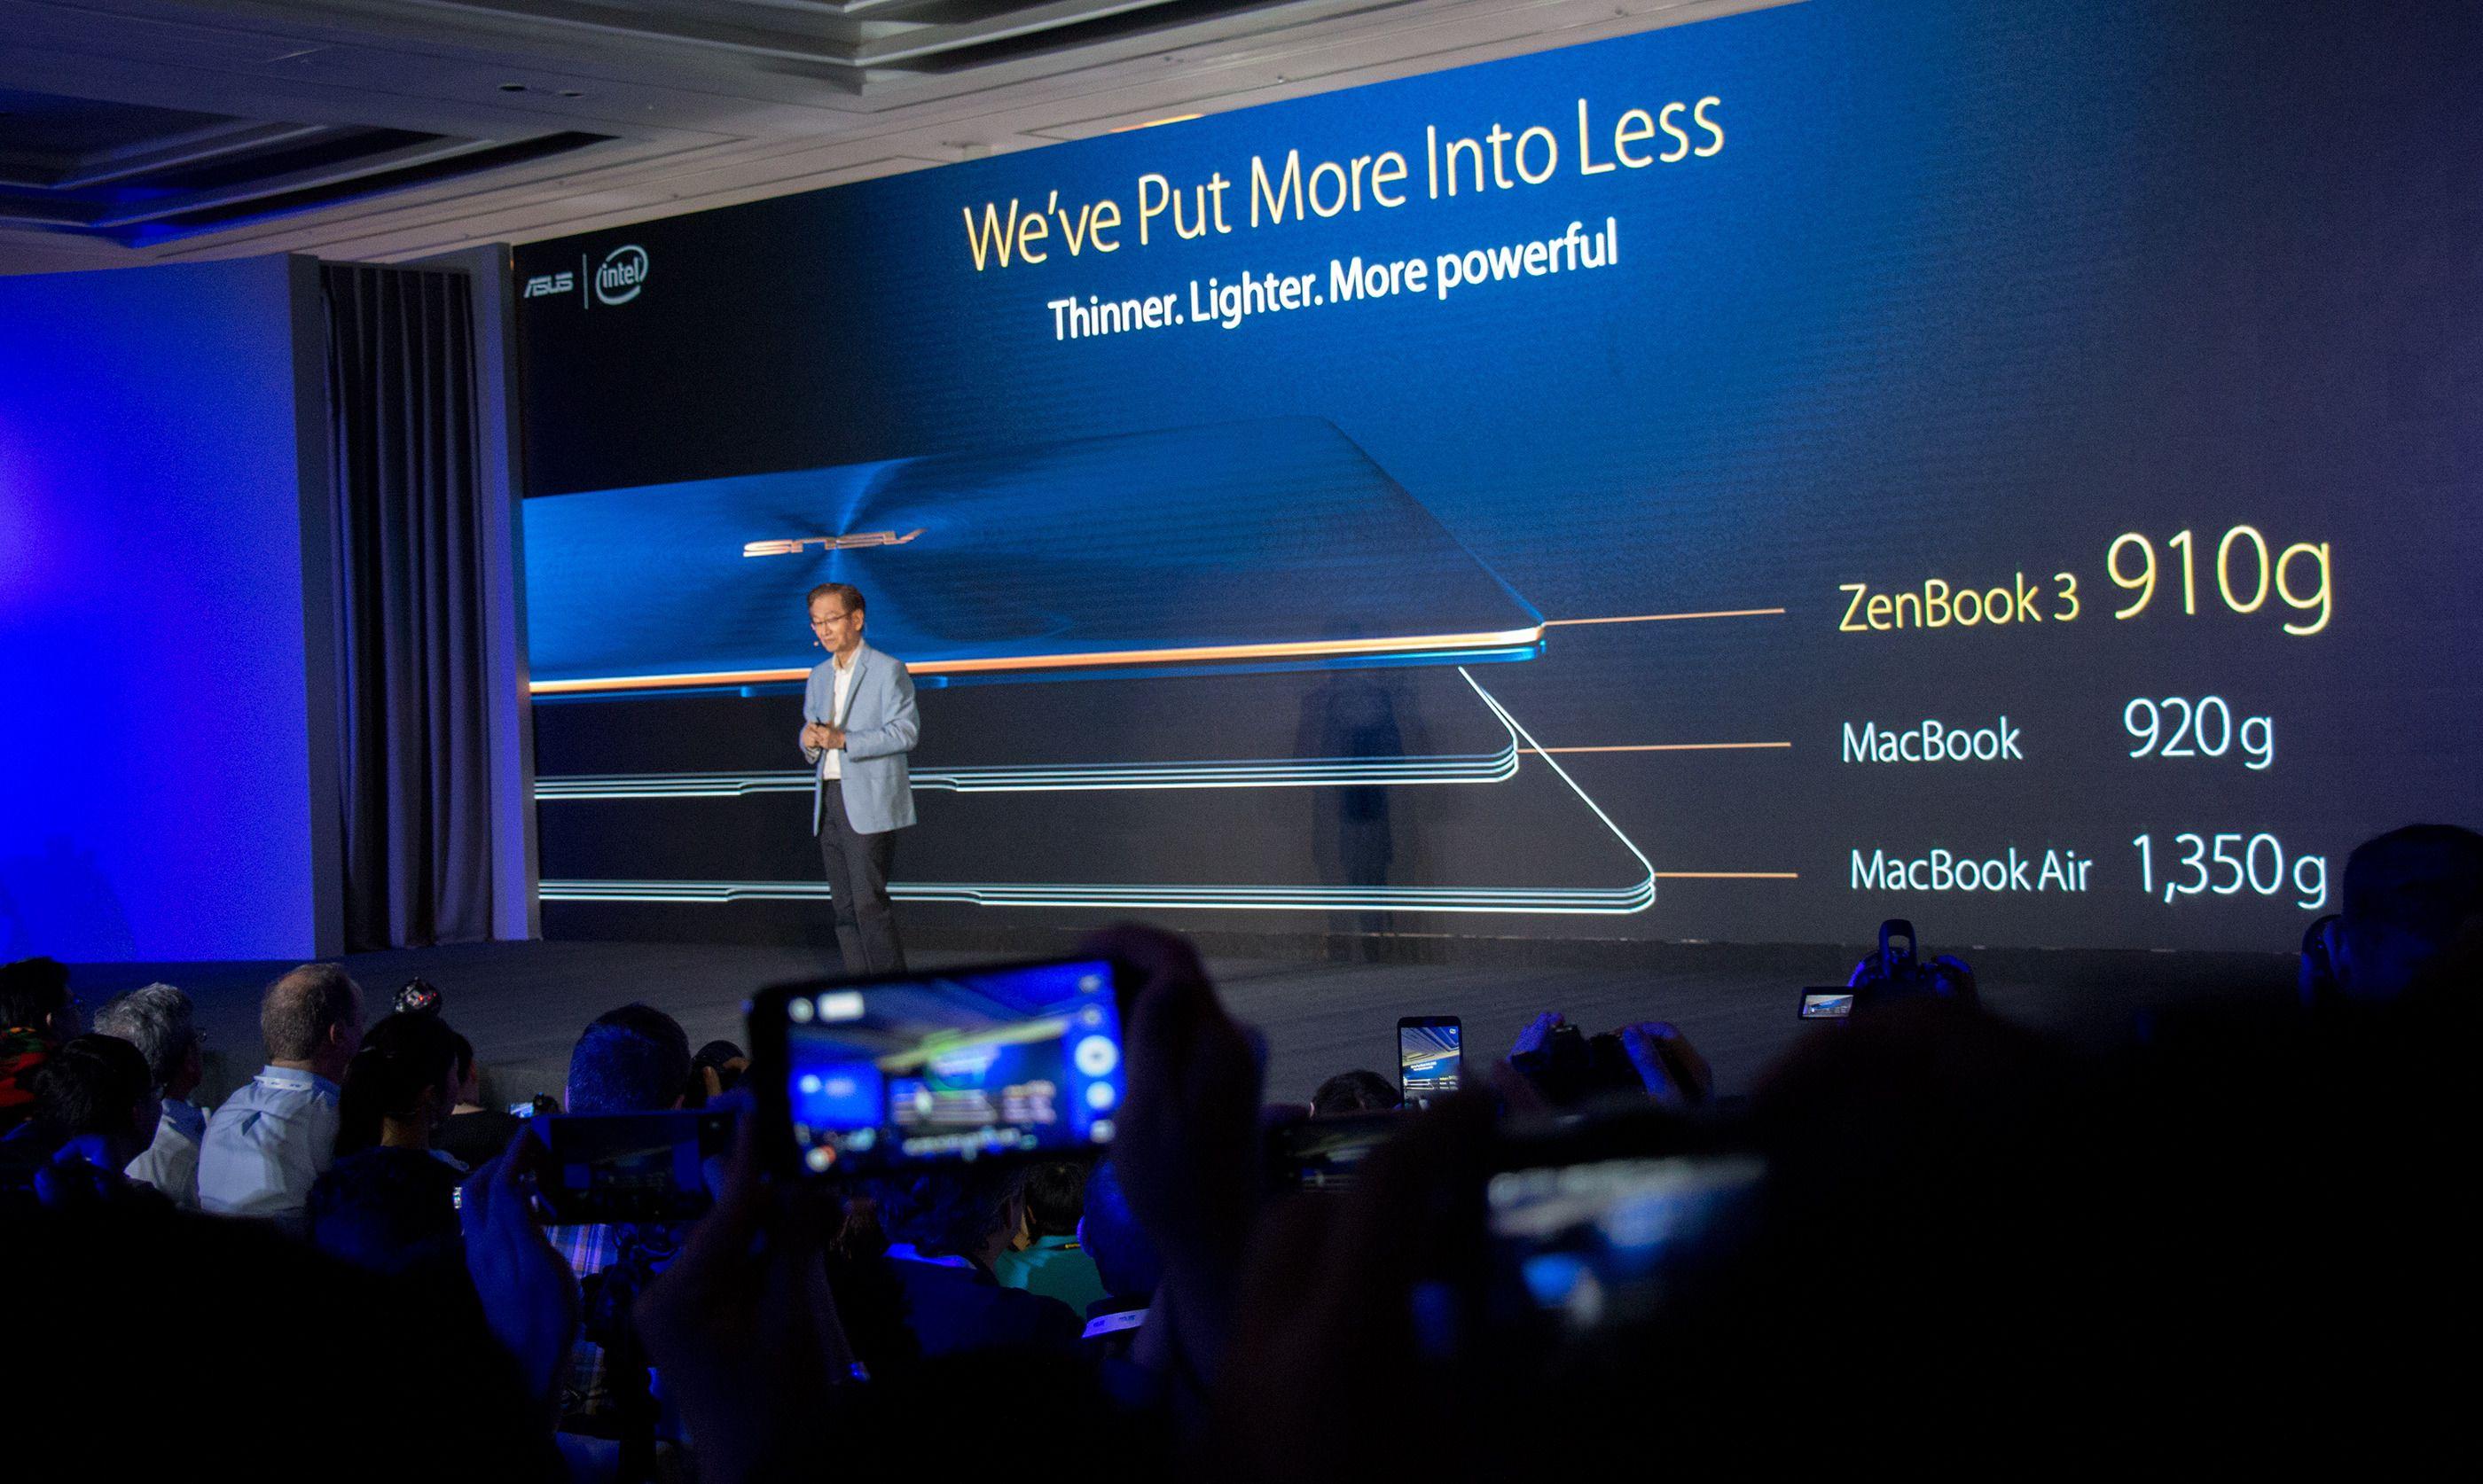 Asus-sjef Jonney Shih er fornøyd med ZenBook 3.